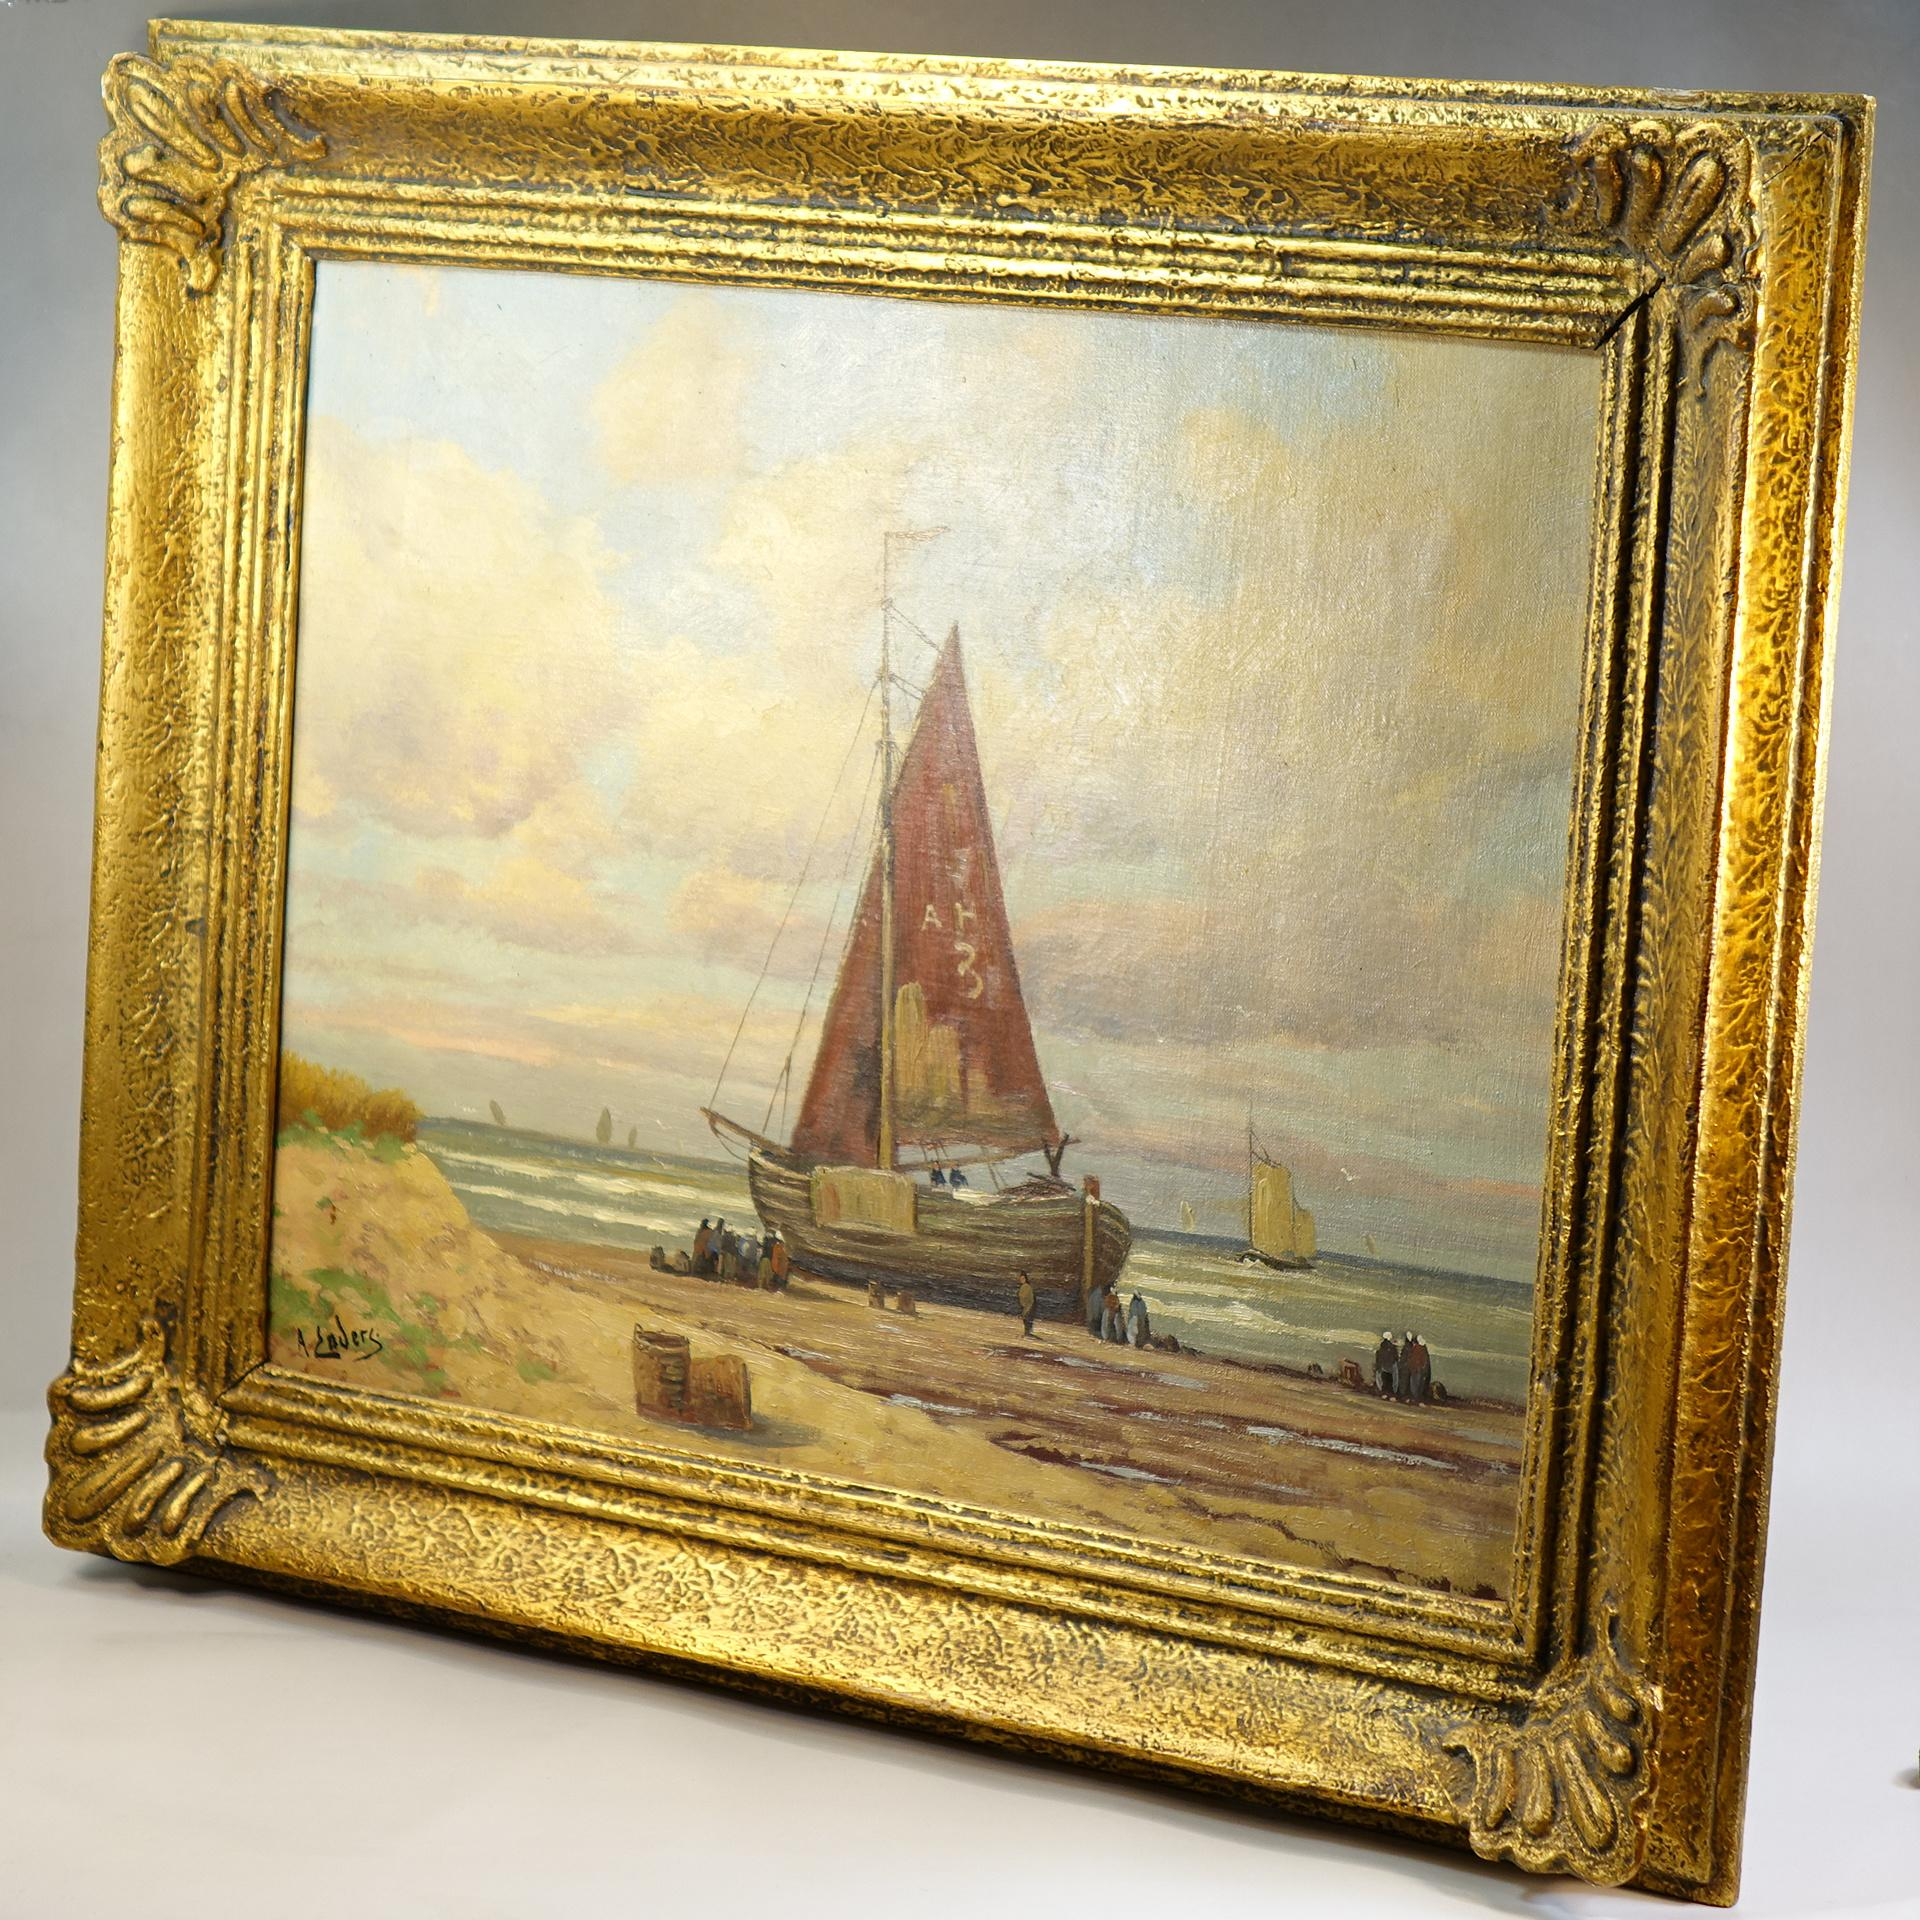 1920s歐洲藝術家古董繪畫